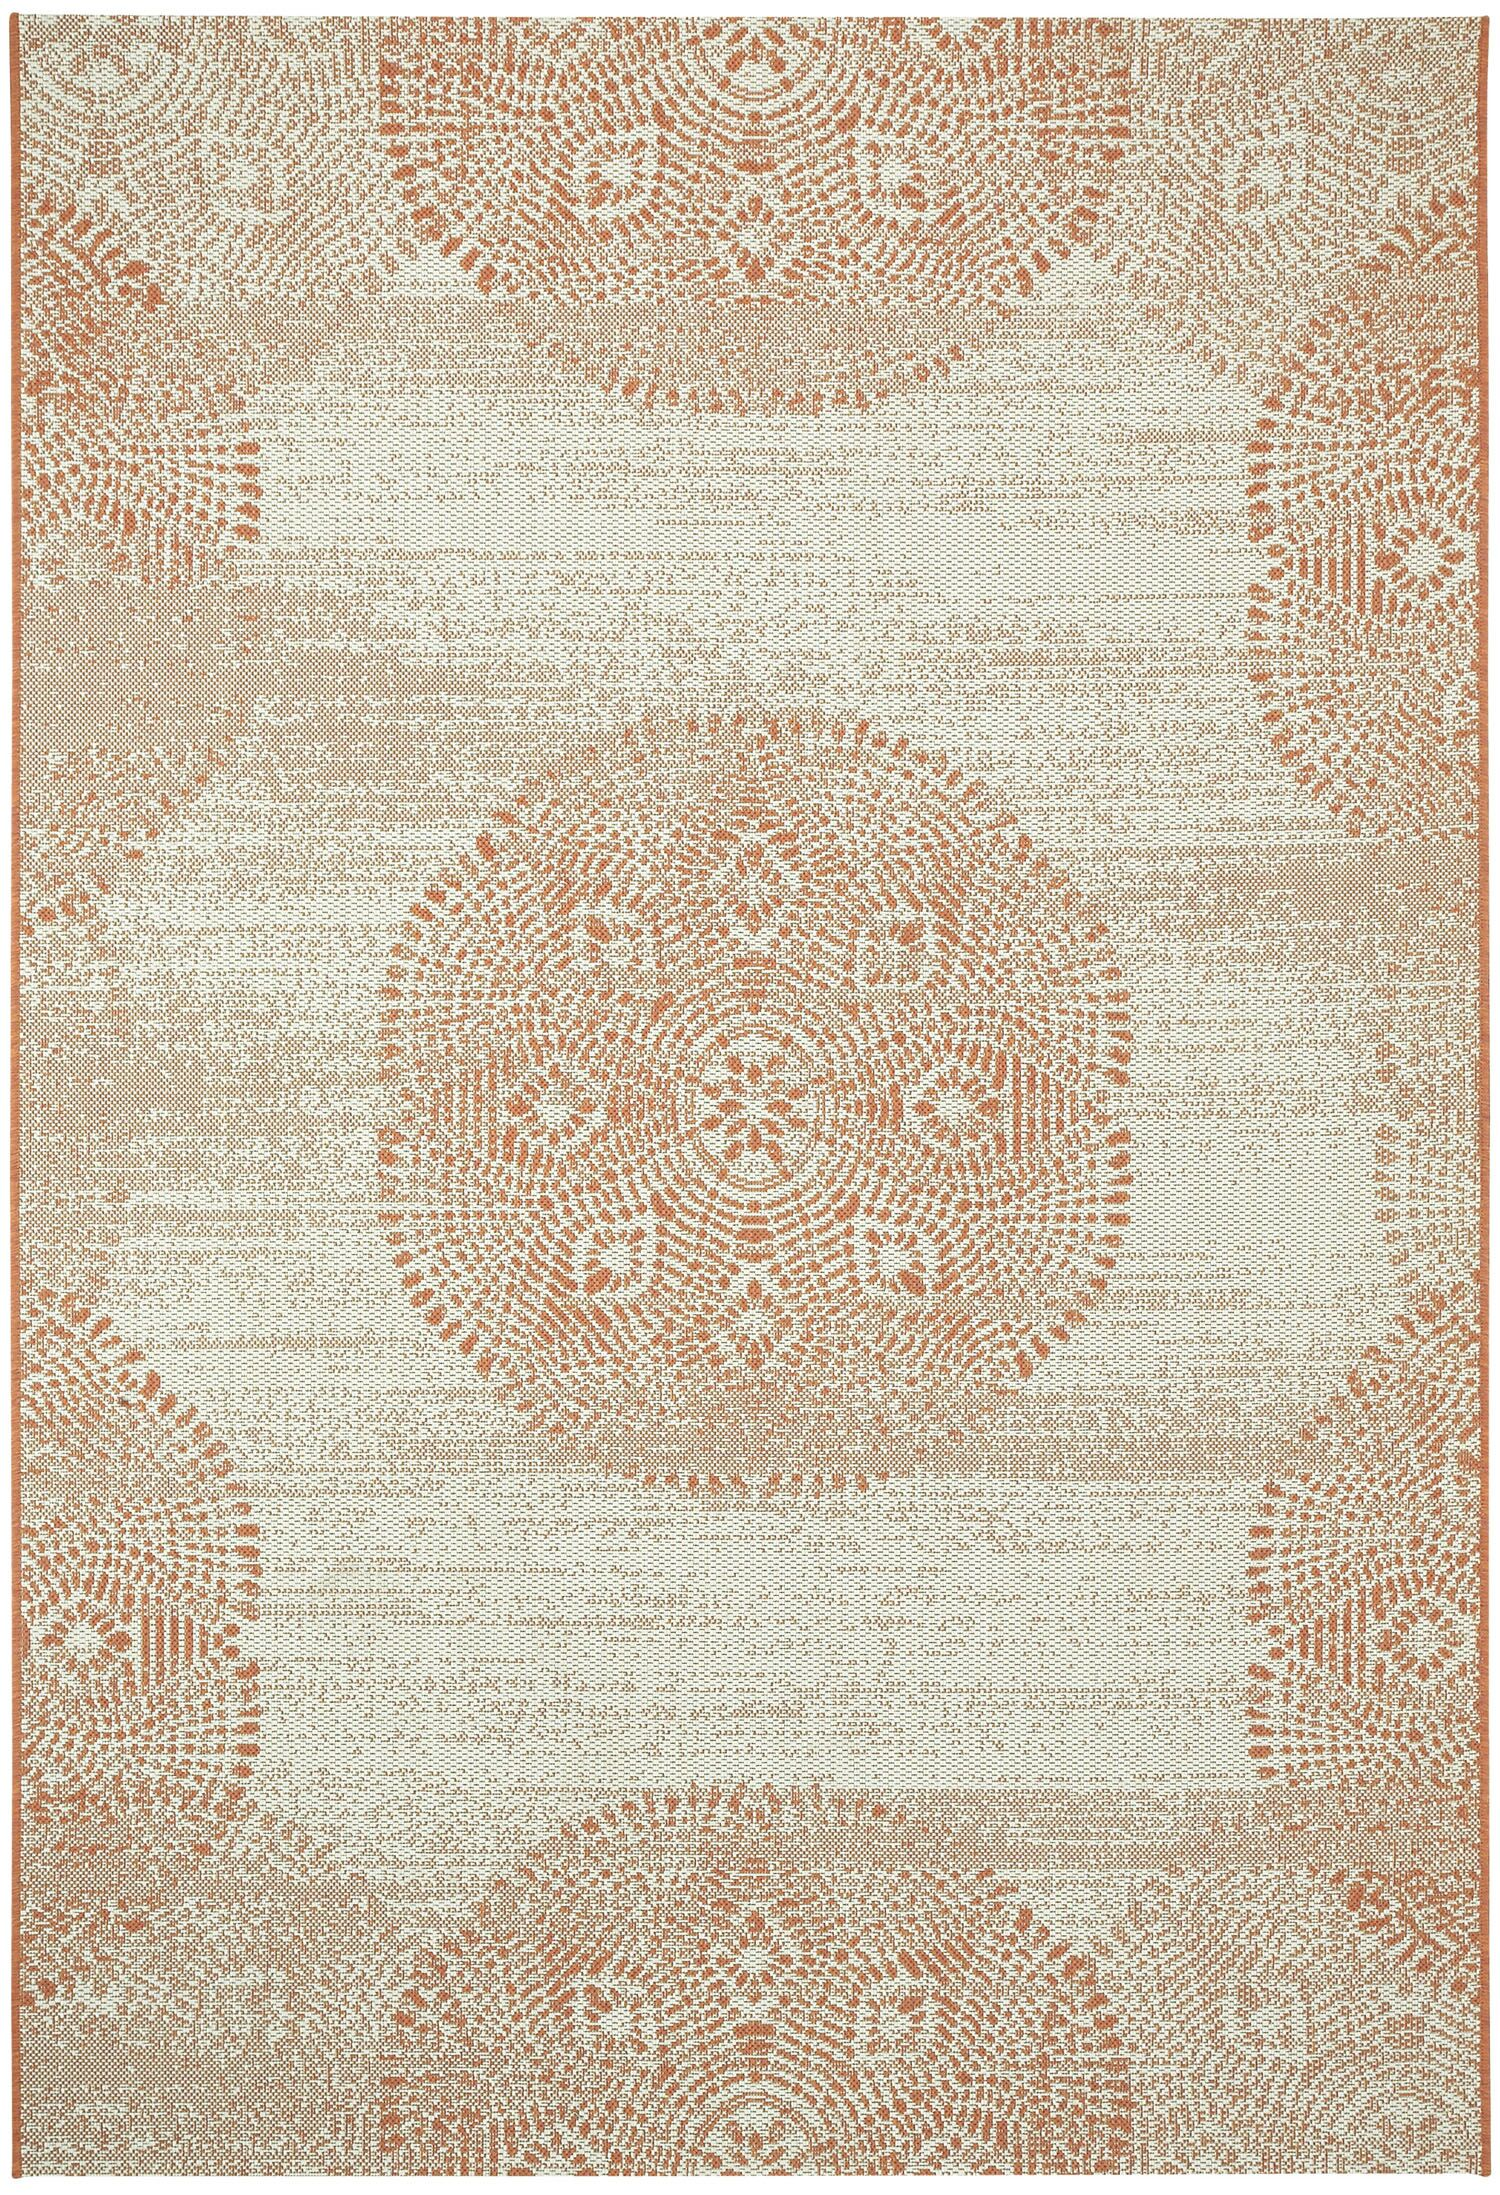 Malayah Gray/Brown Area Rug Rug Size: Rectangle 3'11